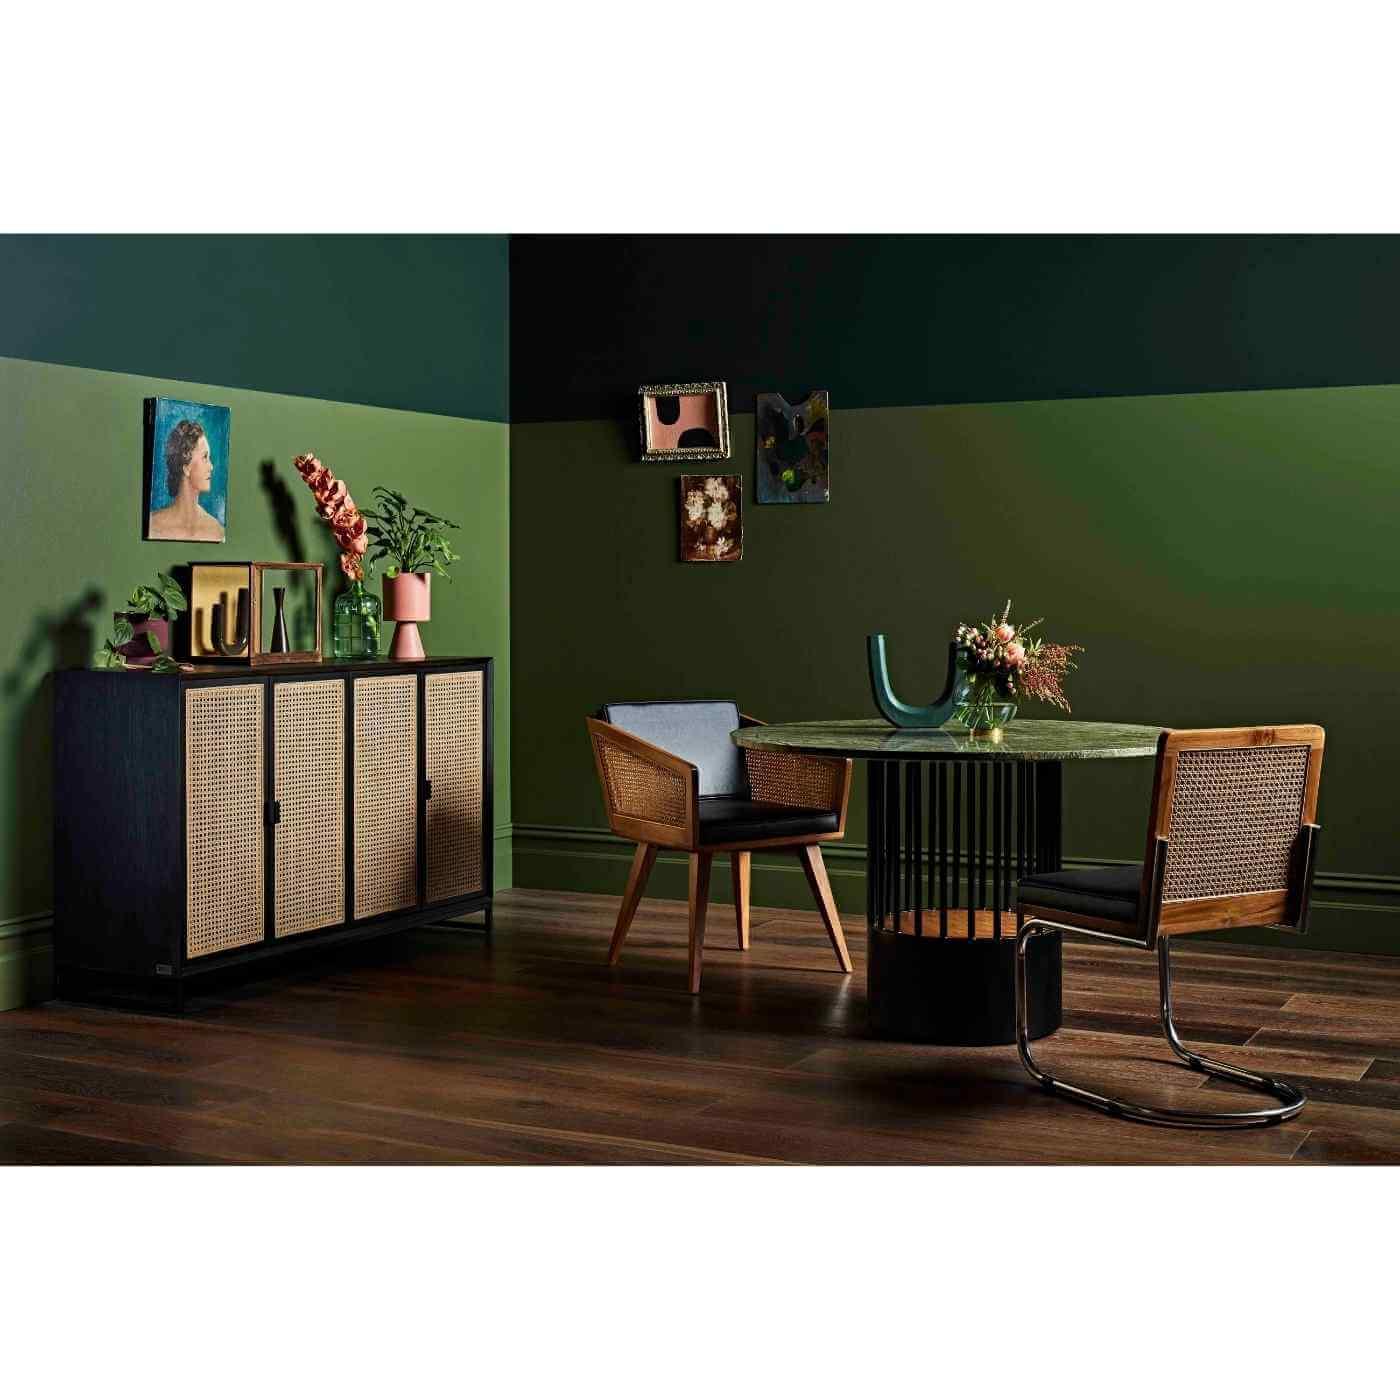 Reddie Furniture Suzy rattan sideboard on Two Design Lovers